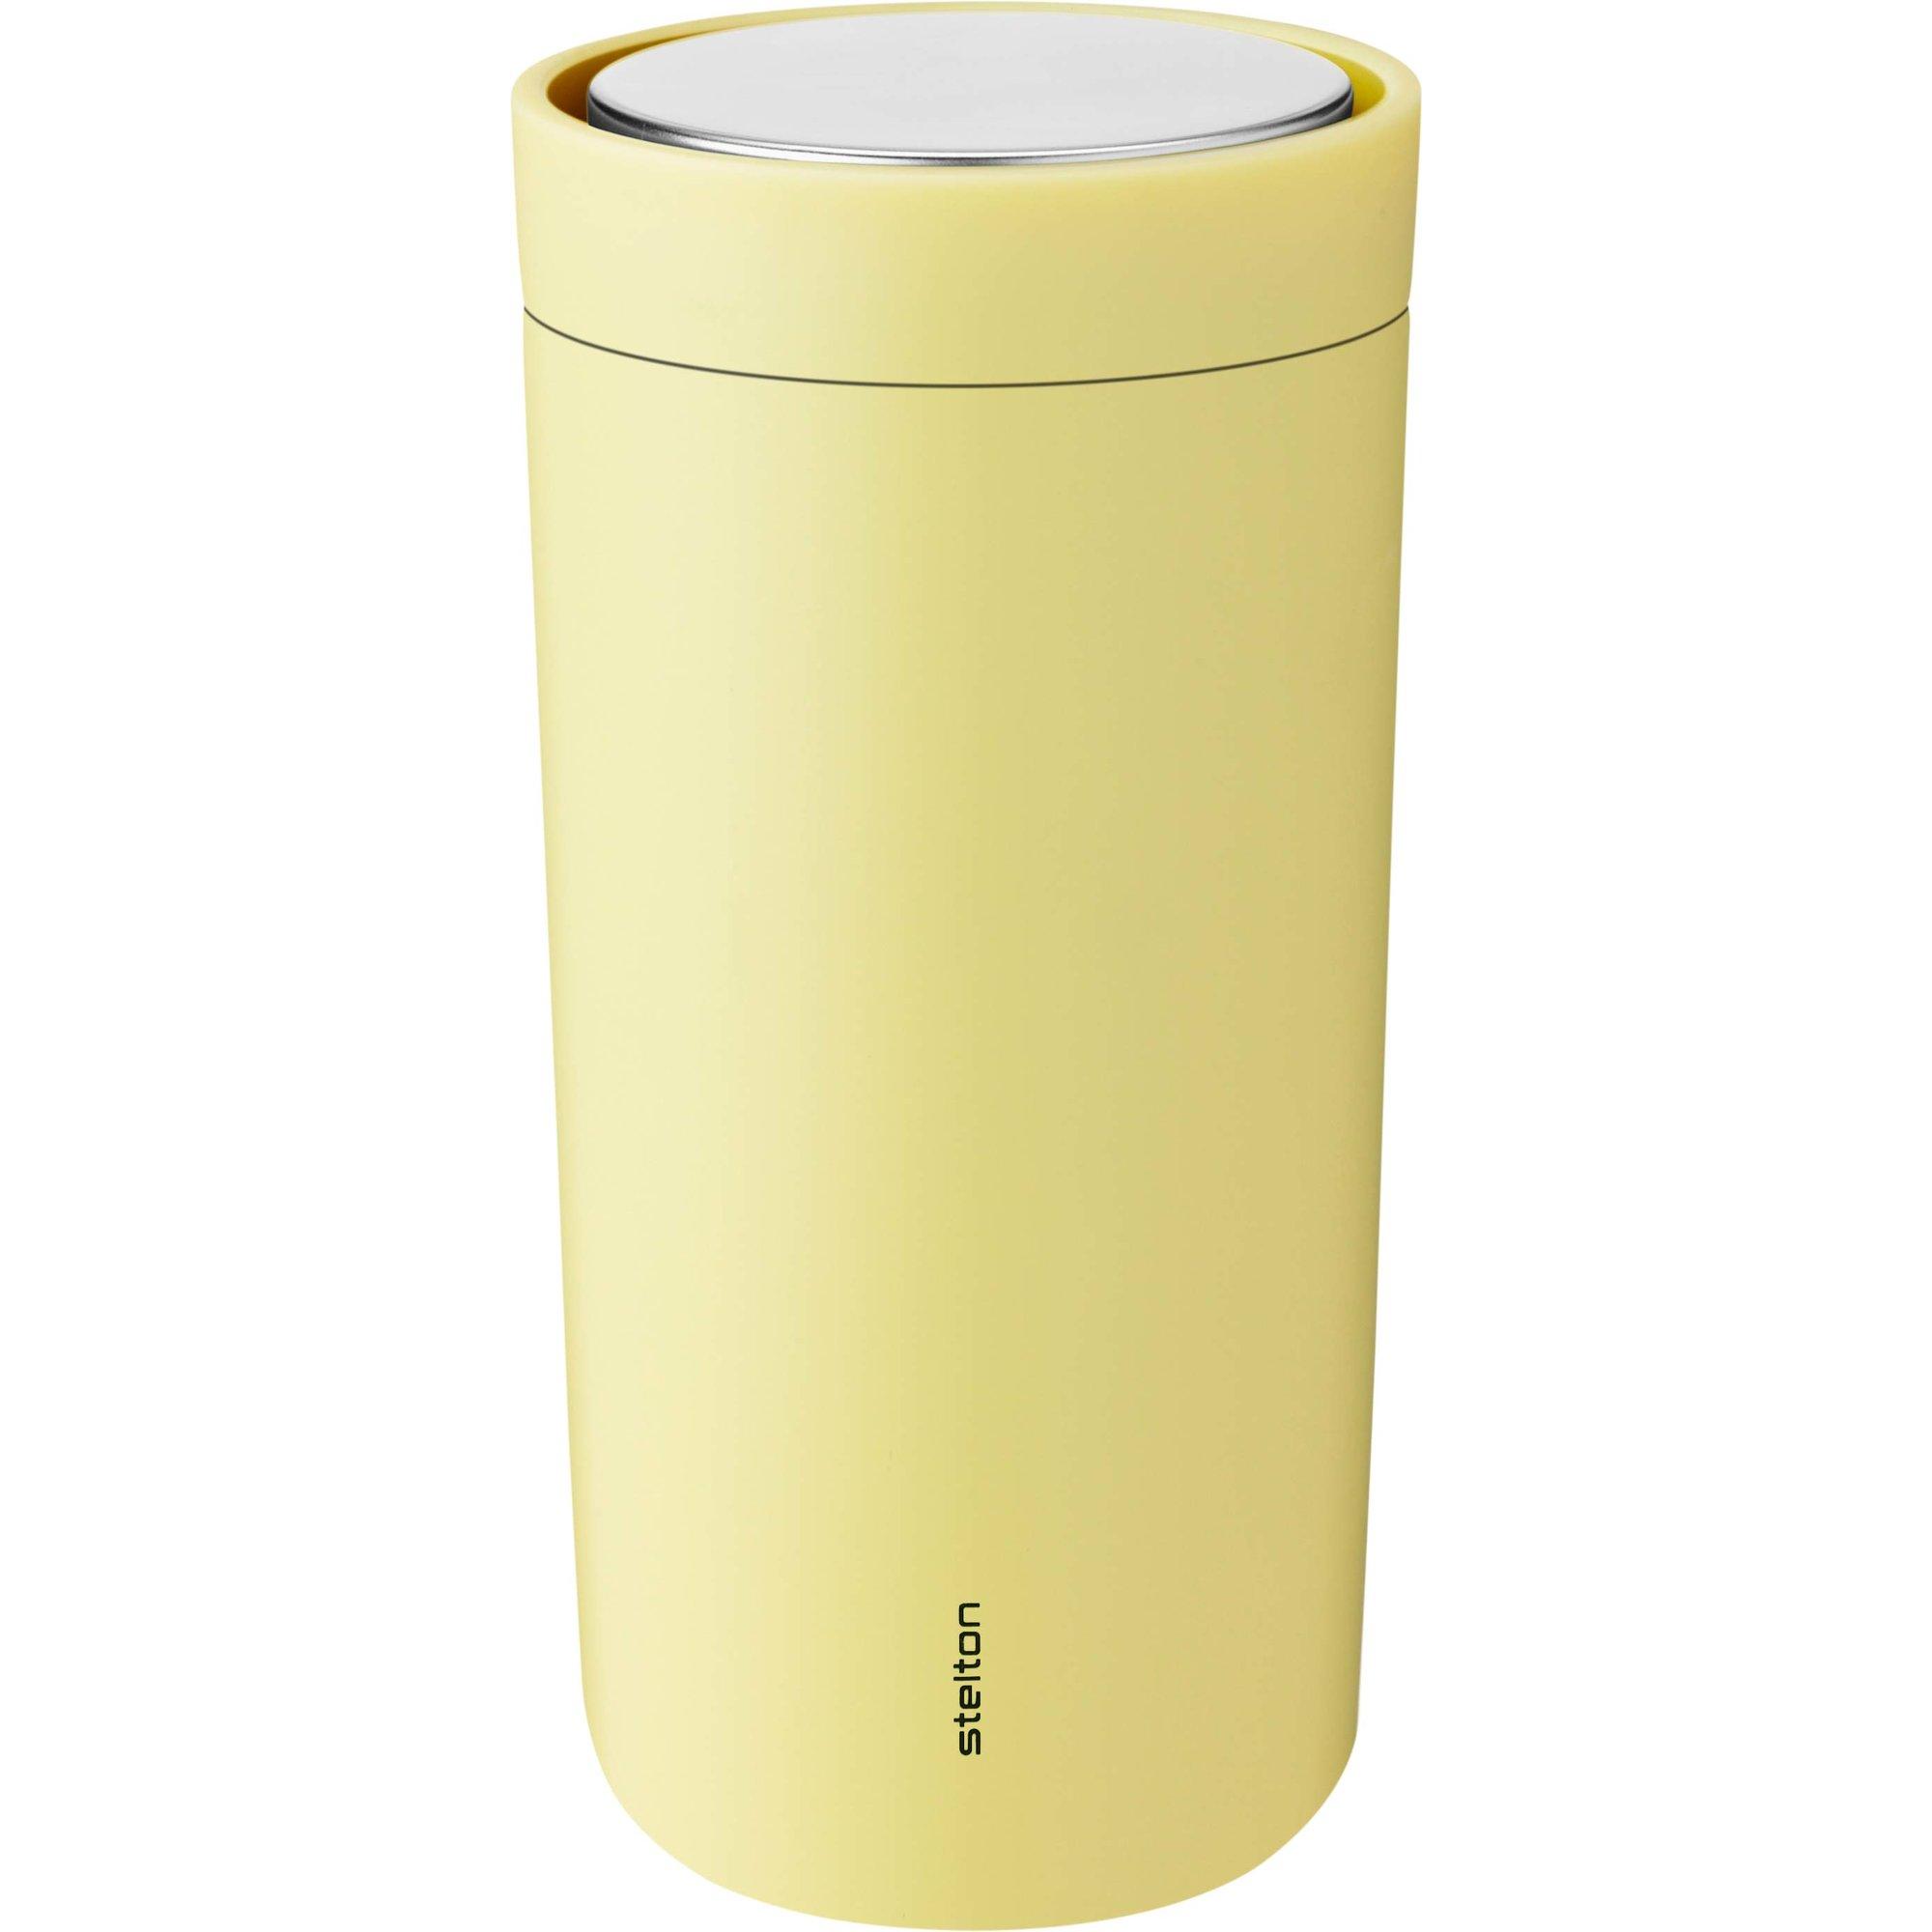 Stelton To Go Click termoskopp 04 liter gul